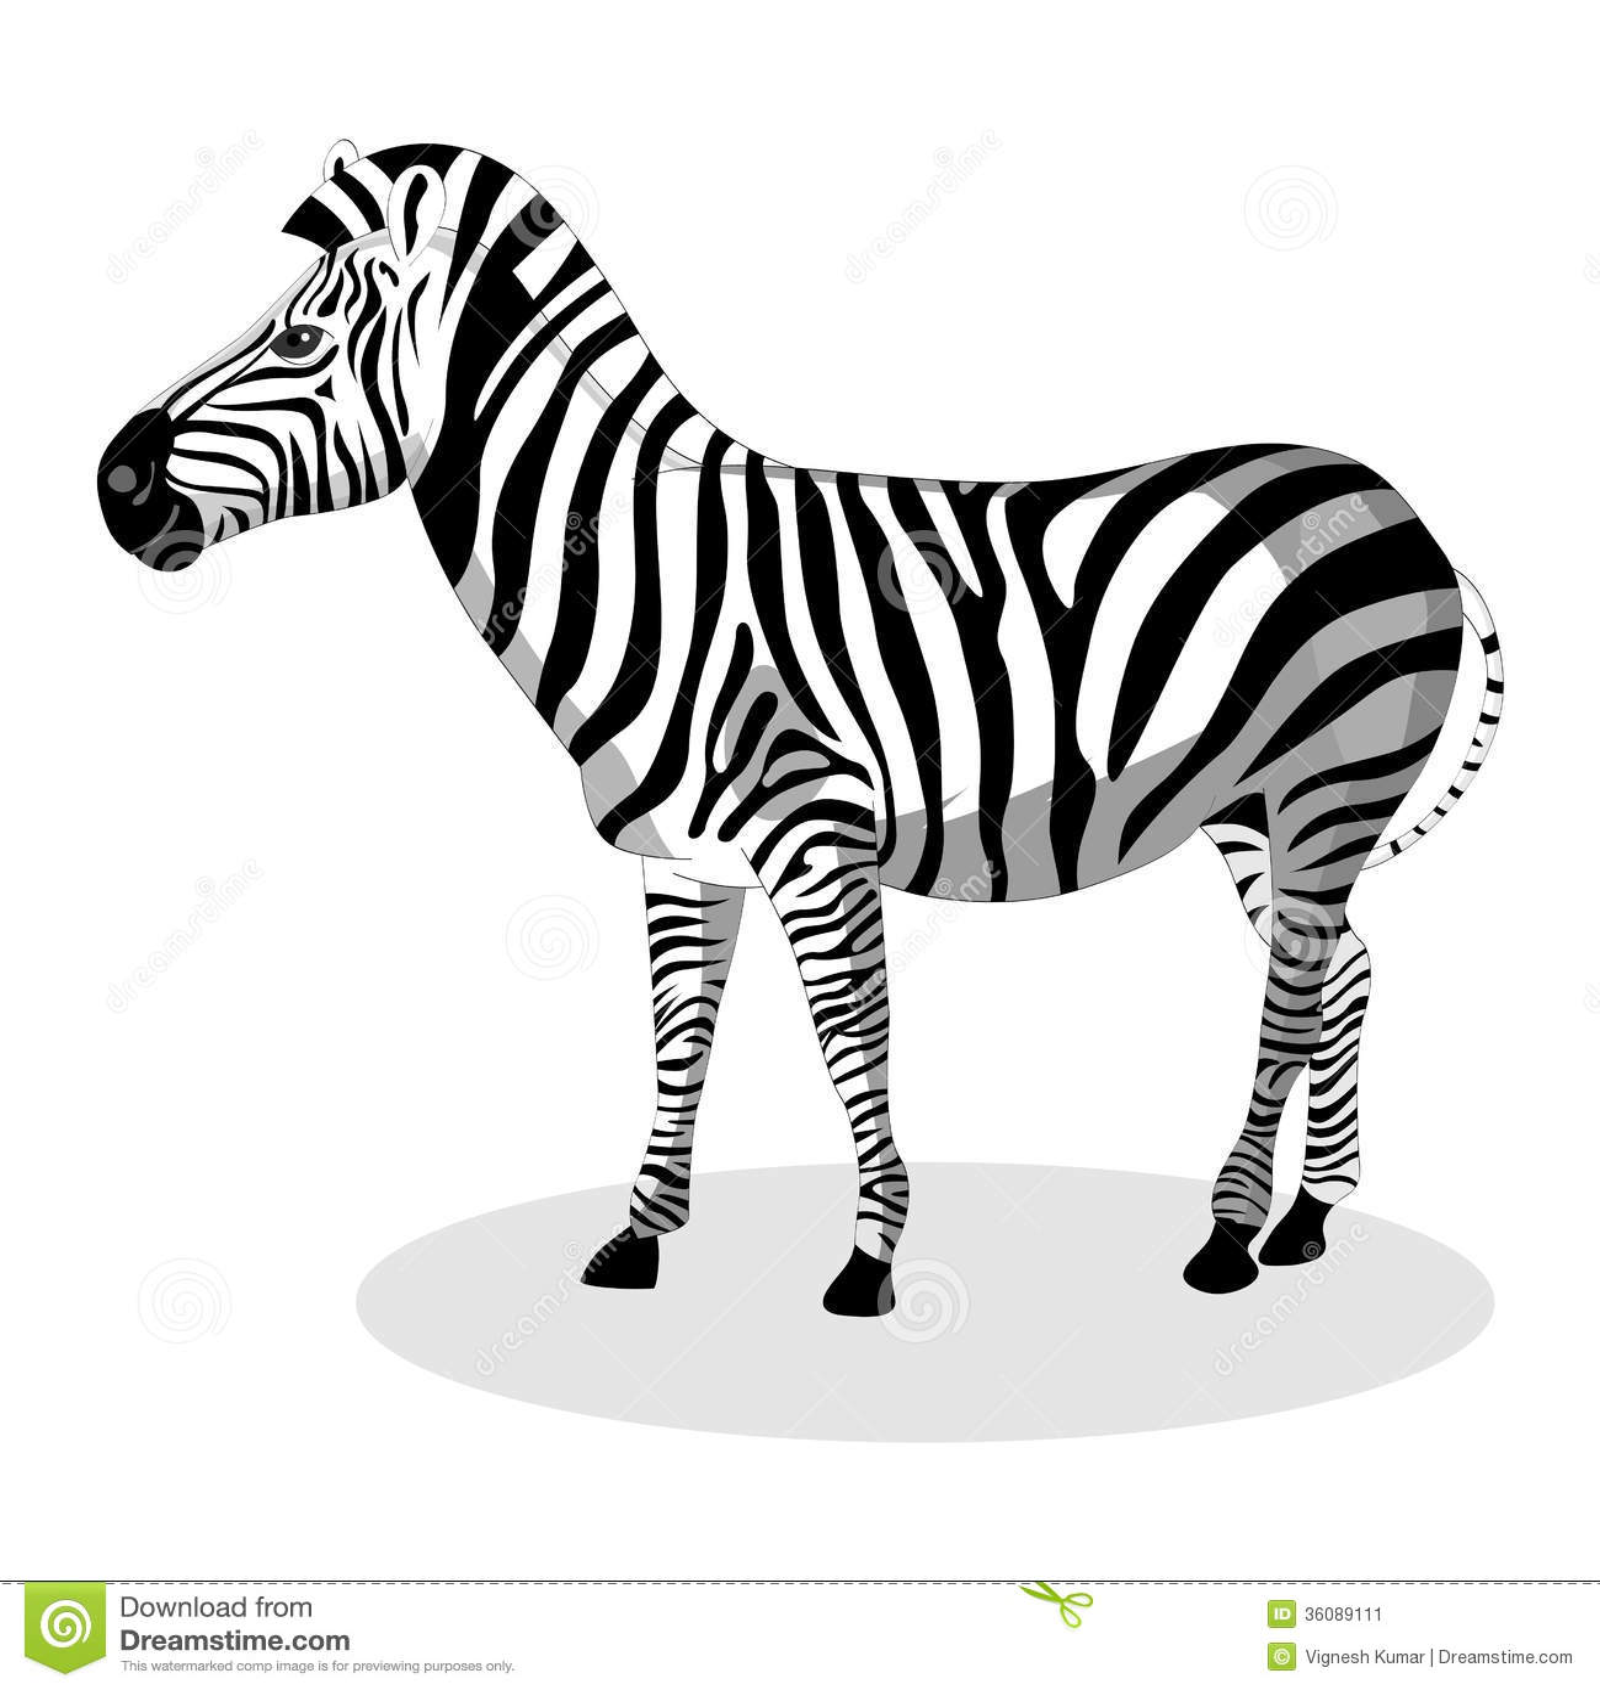 Zebra Cartoons Illustrations Amp Vector Stock Images